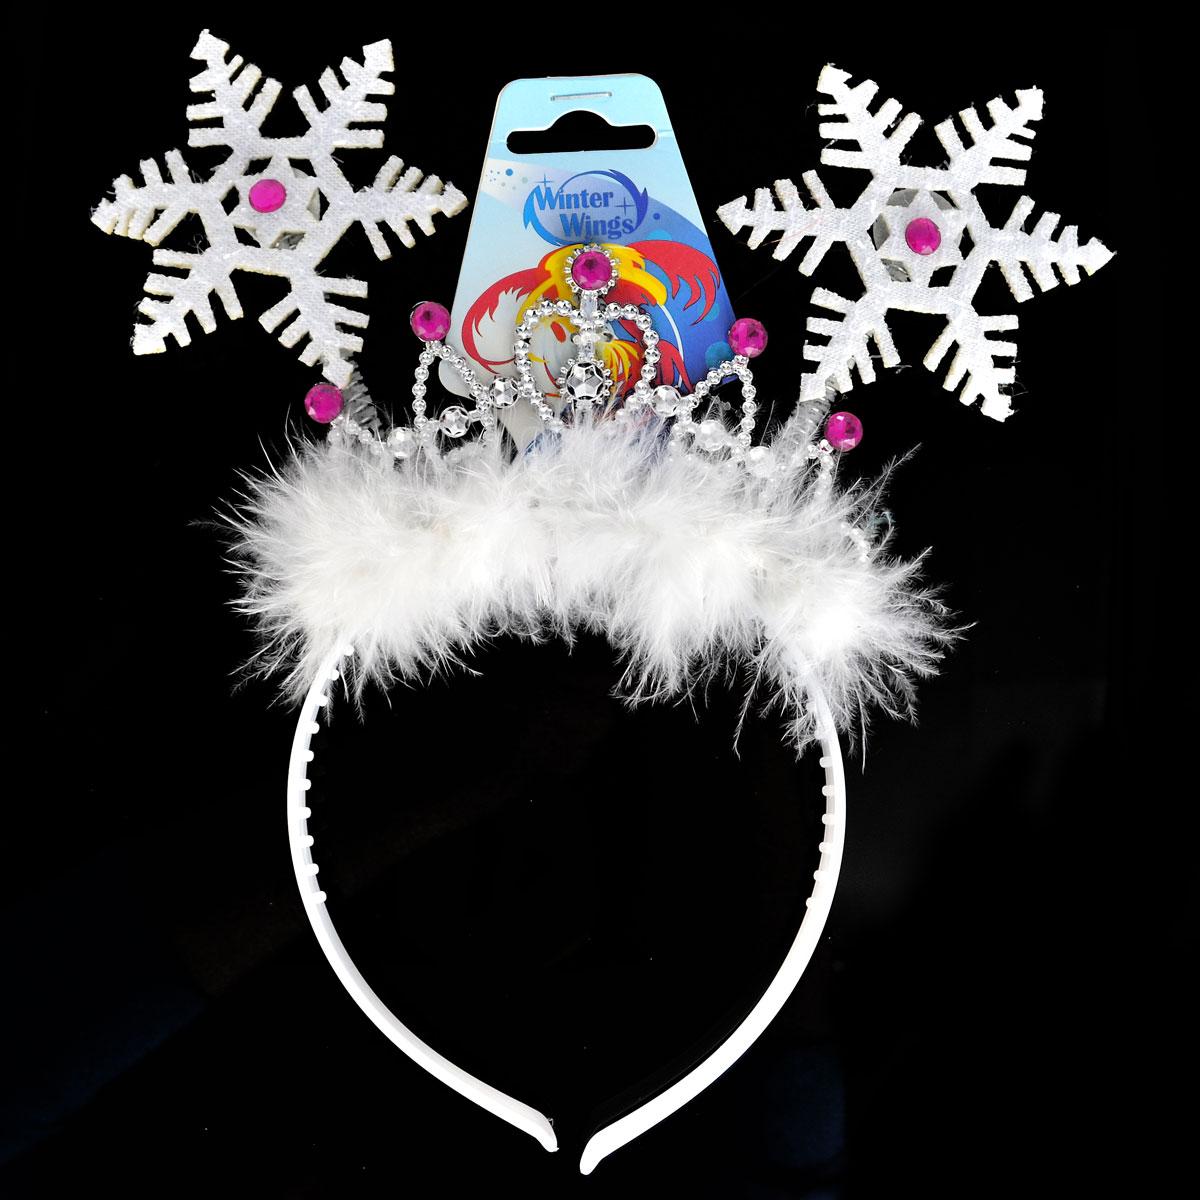 Карнавальный ободок Winter Wings Звезды<br>